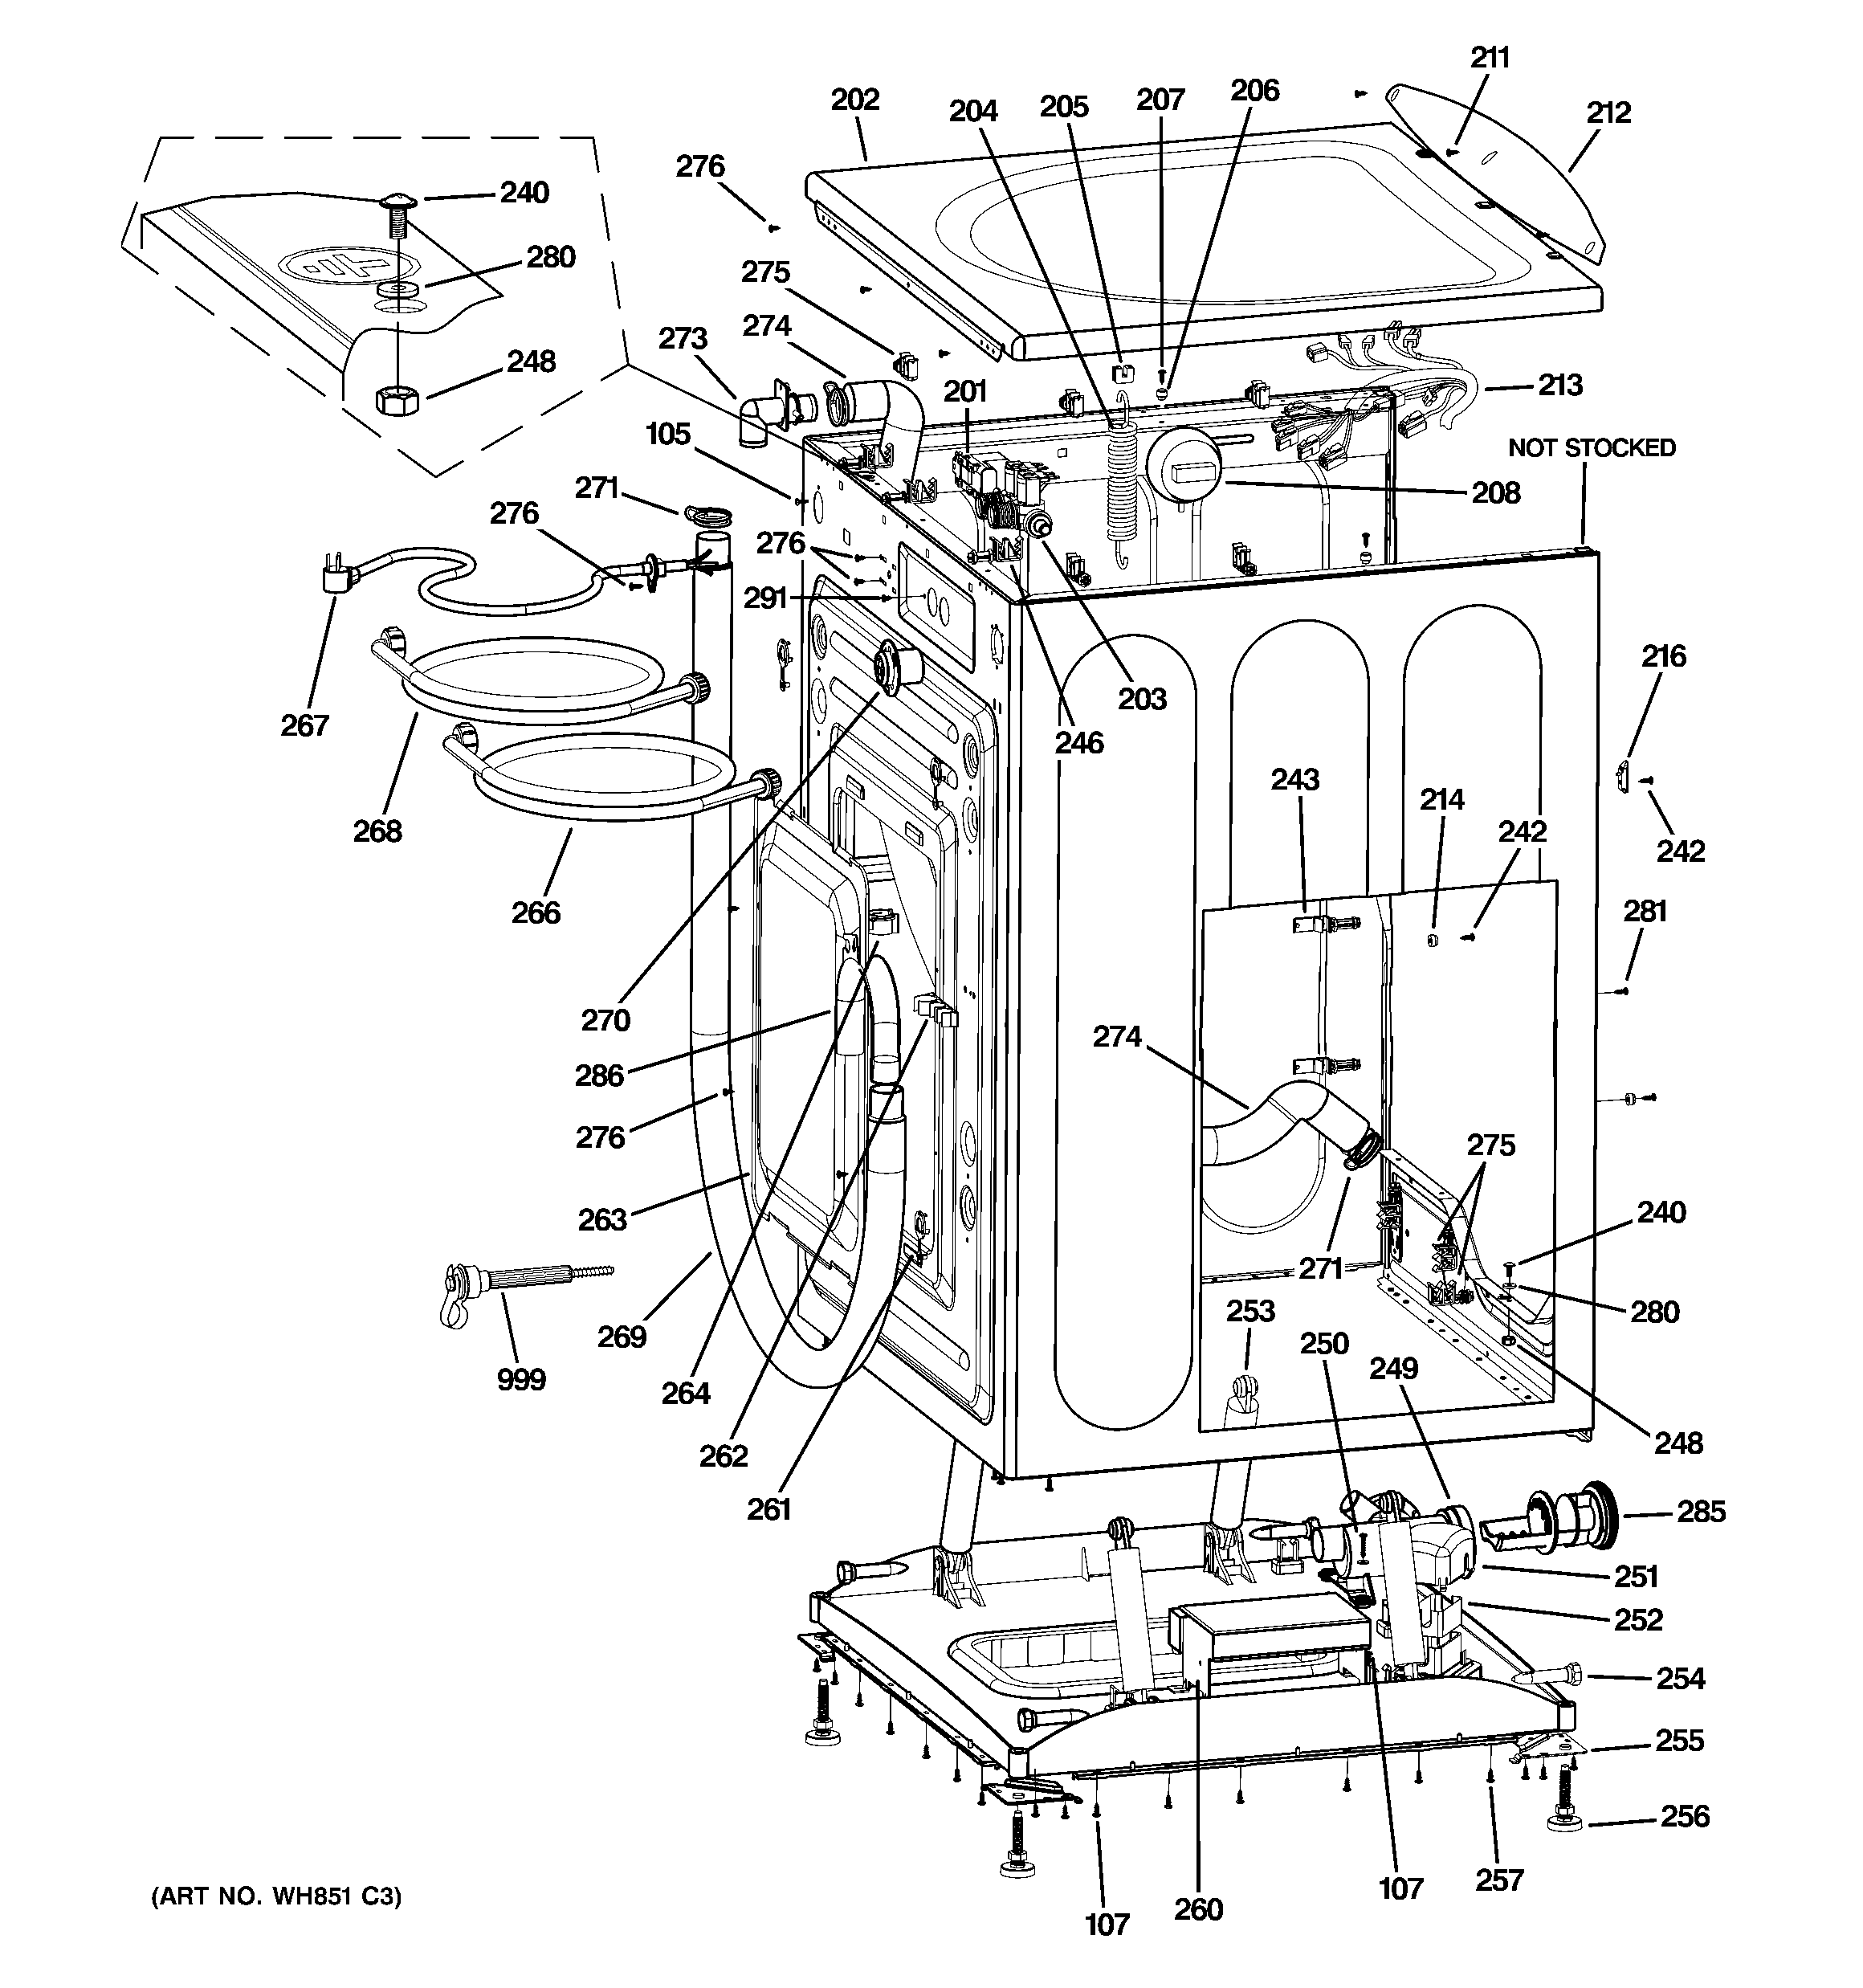 ge washer schematic wiring diagram sc 1843  wiring diagram wbse3120b2ww ge washing machine free diagram  wiring diagram wbse3120b2ww ge washing